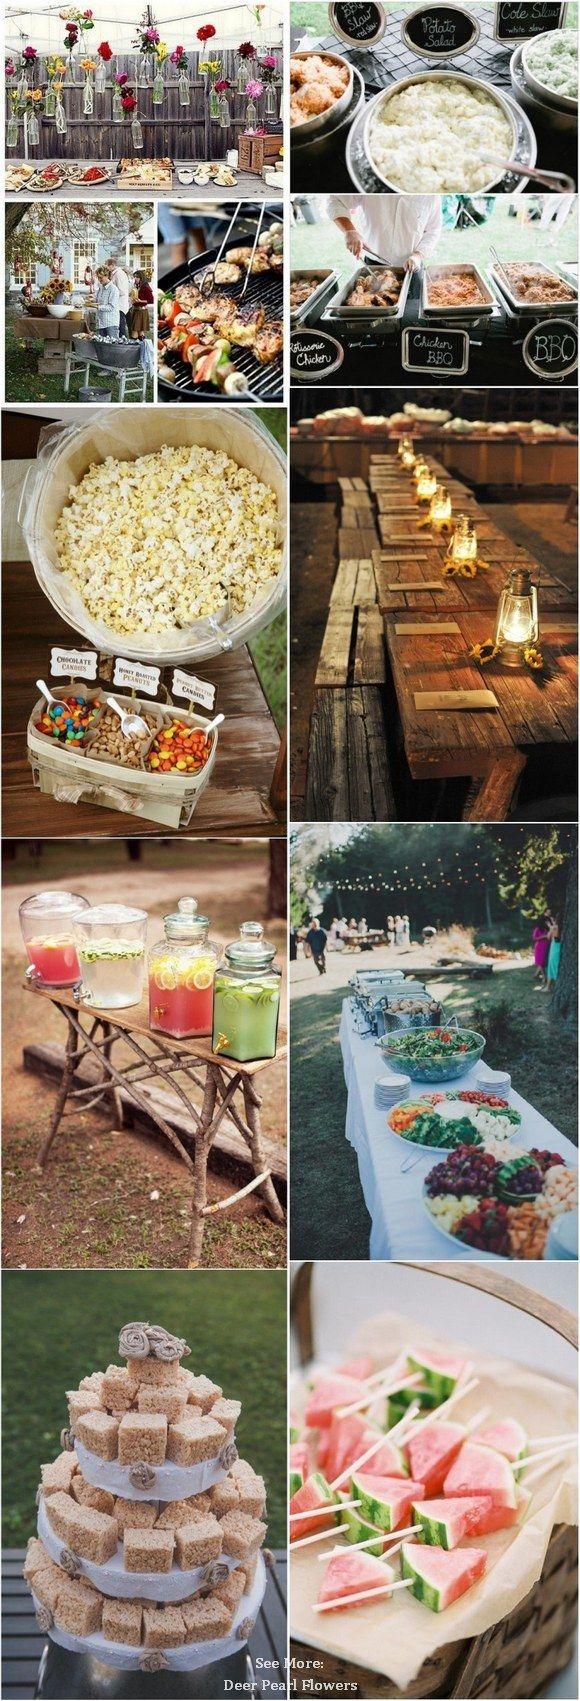 Top 25 Rustic Barbecue BBQ Wedding Ideas | Bbq wedding ...